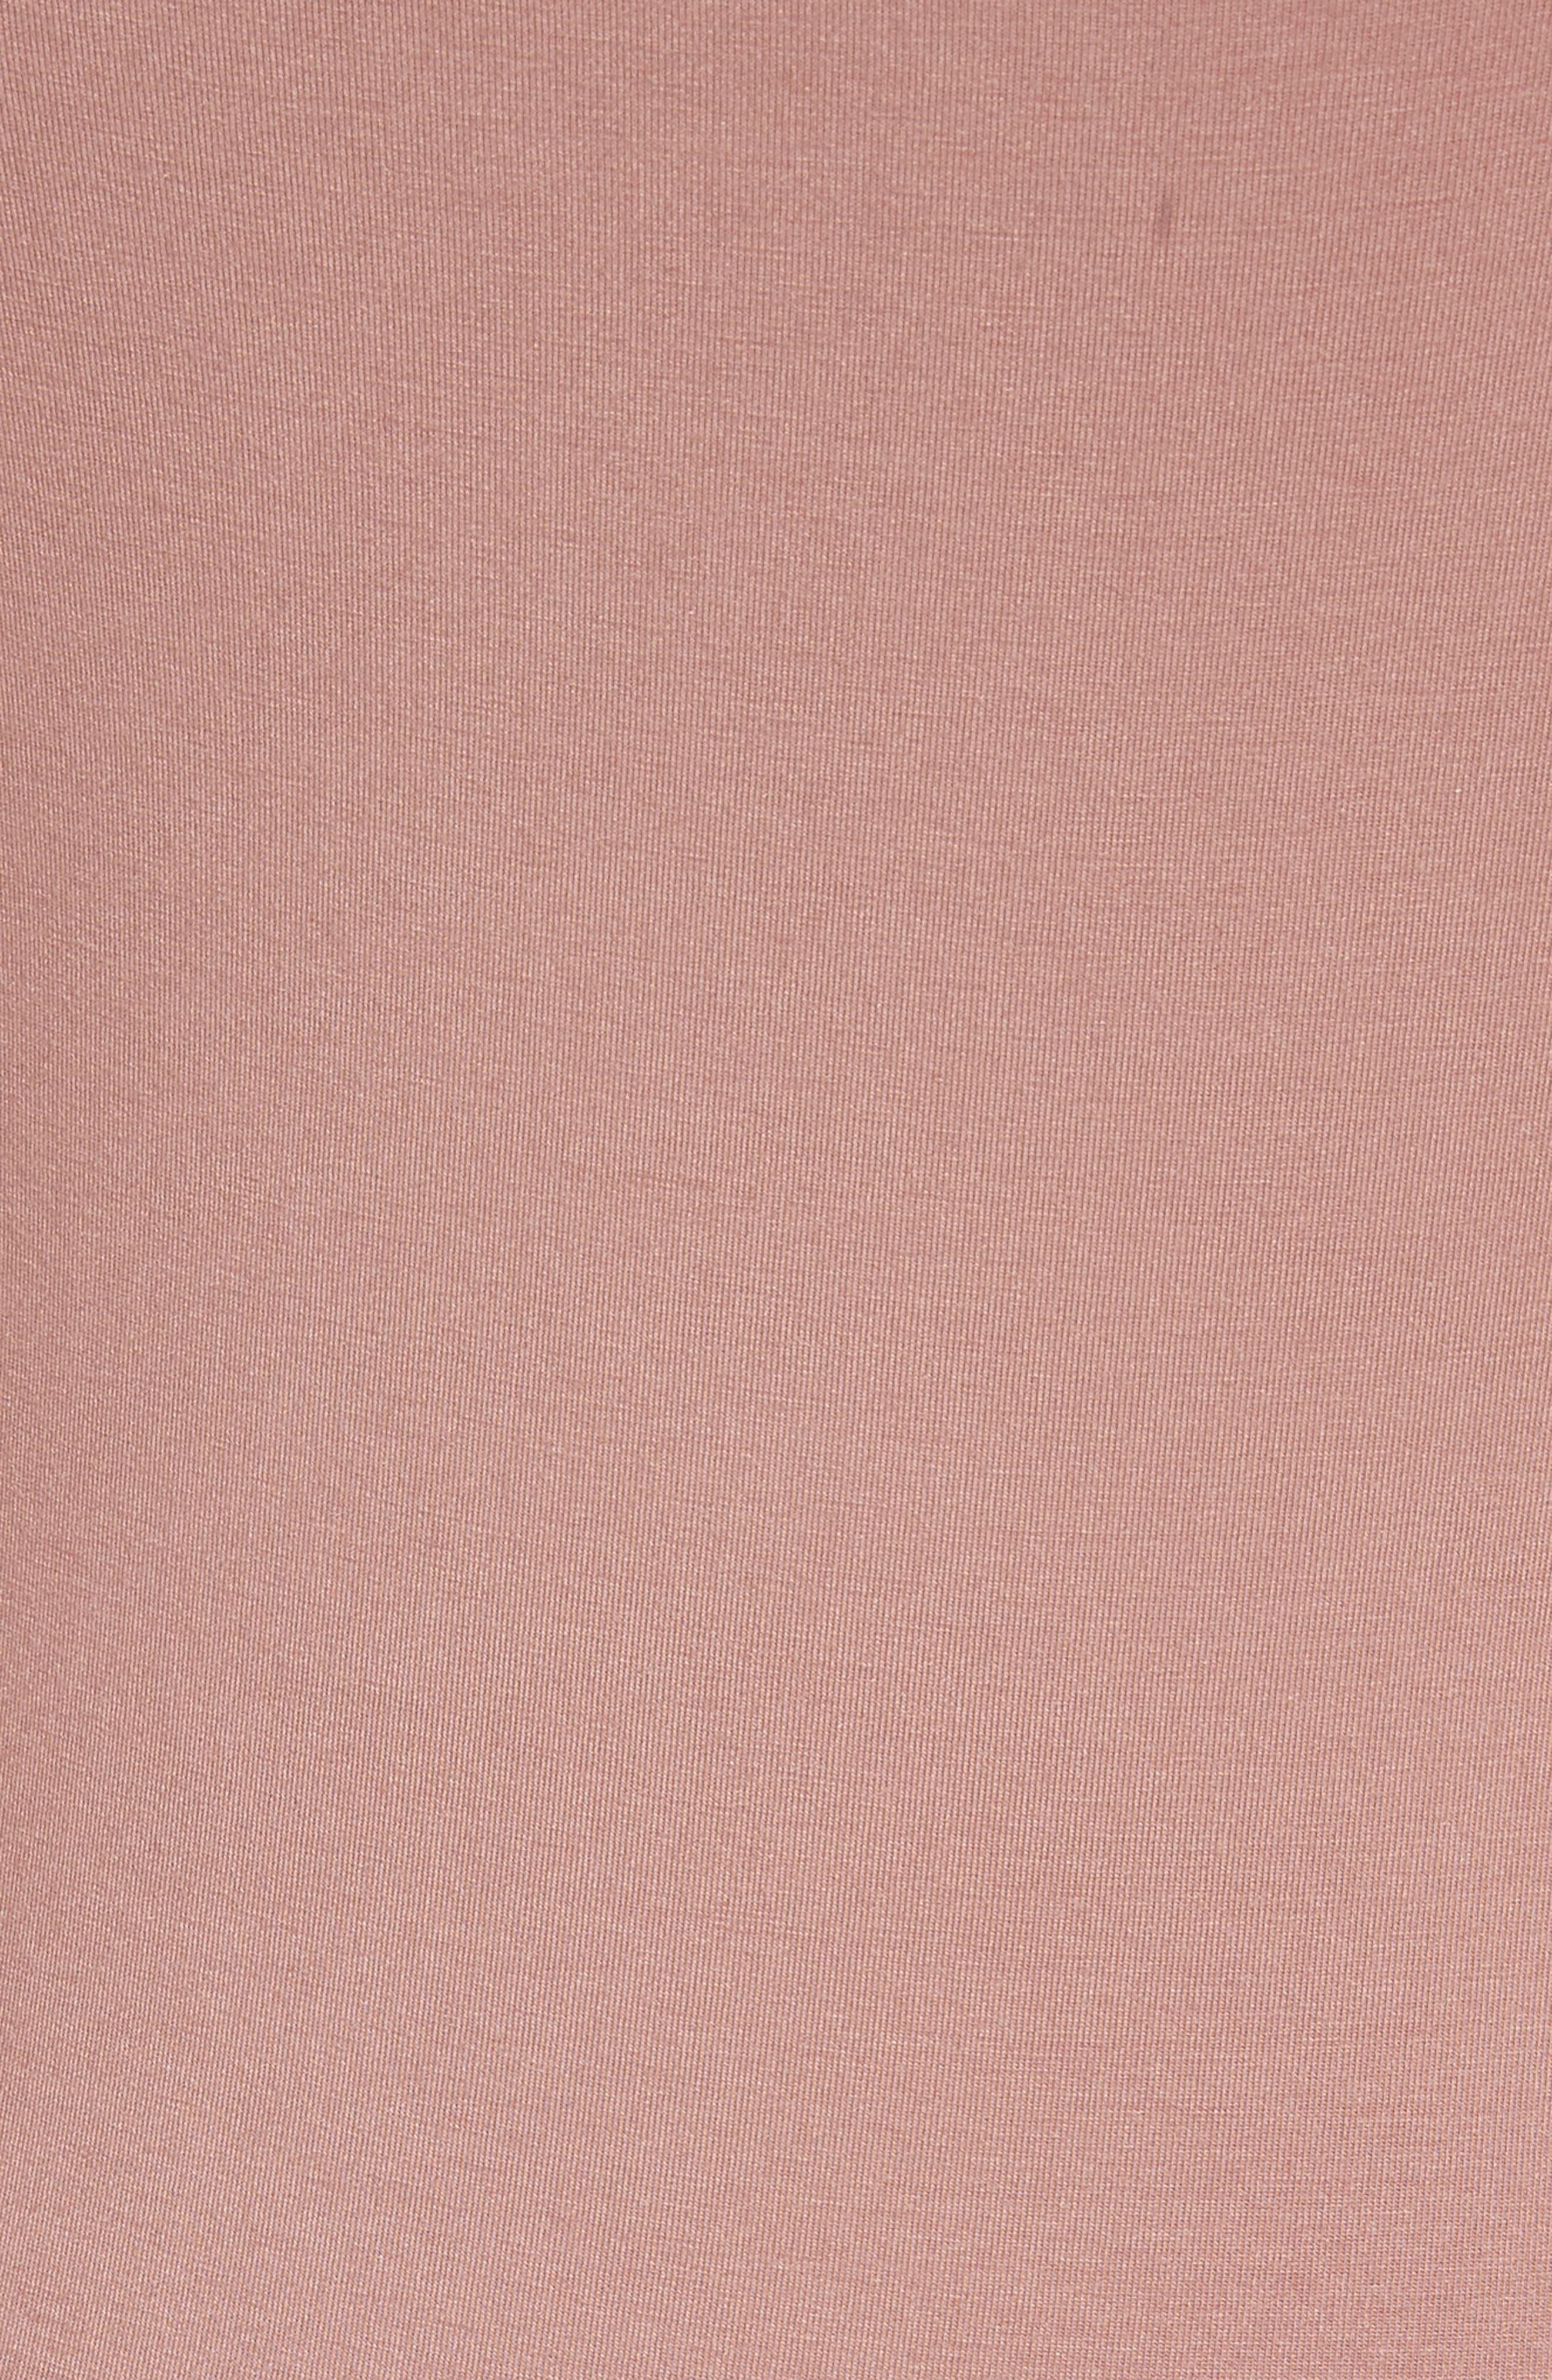 Stretch Jersey Cold Shoulder Dress,                             Alternate thumbnail 5, color,